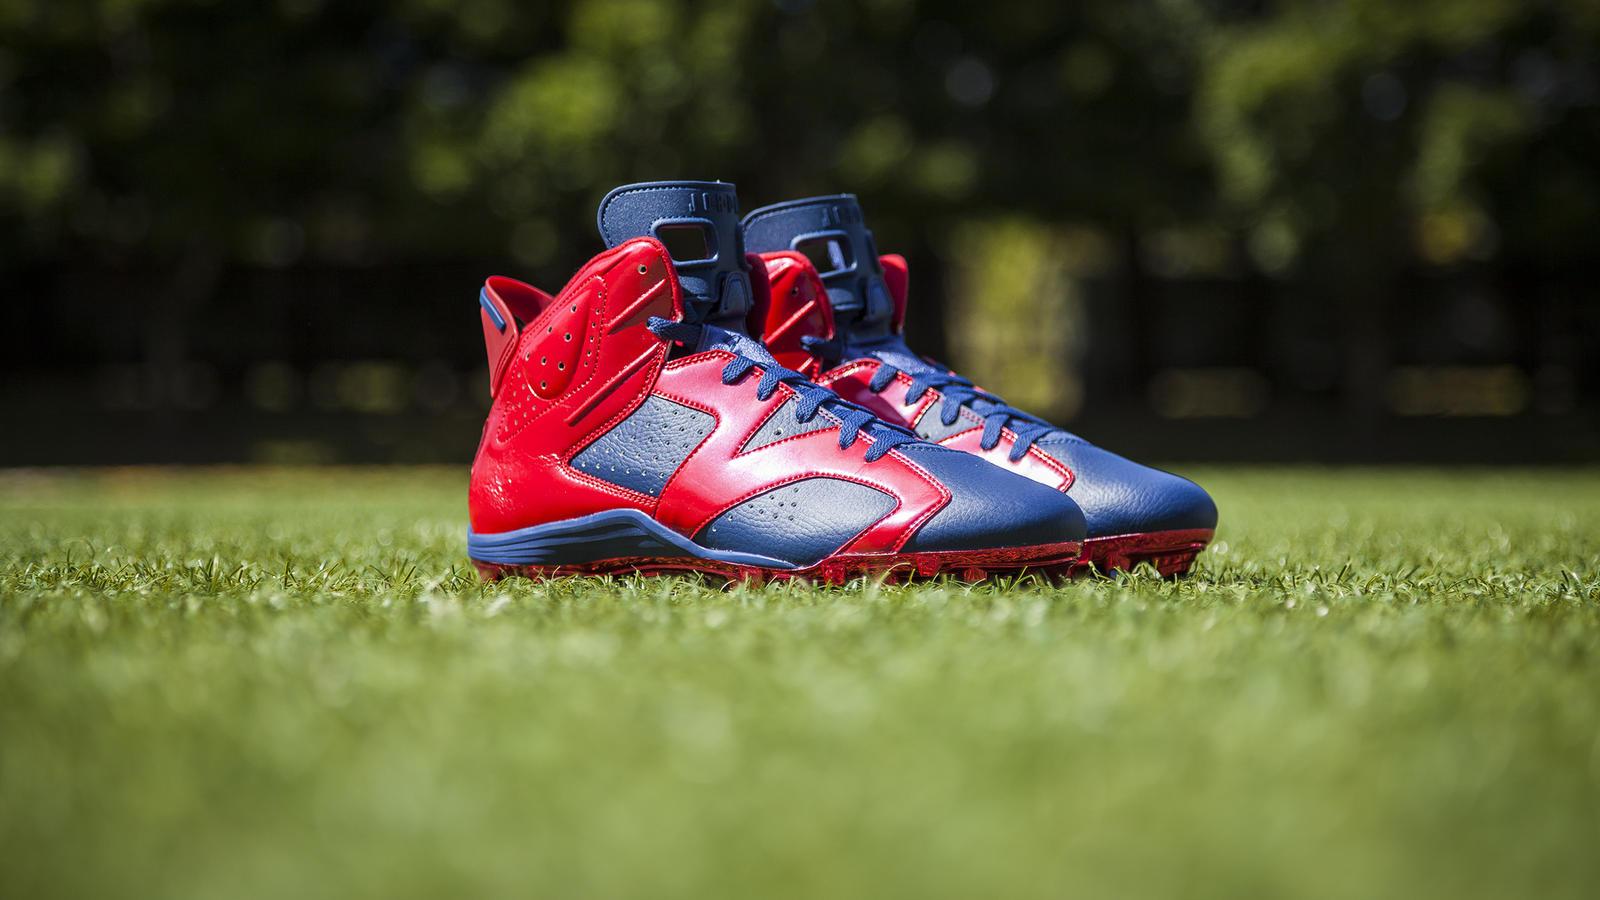 check out 4afe3 bcb39 ... Jordan Brand Football Athletes Don Air Jordan VI Cleats to Start the  Season - Nike News ...